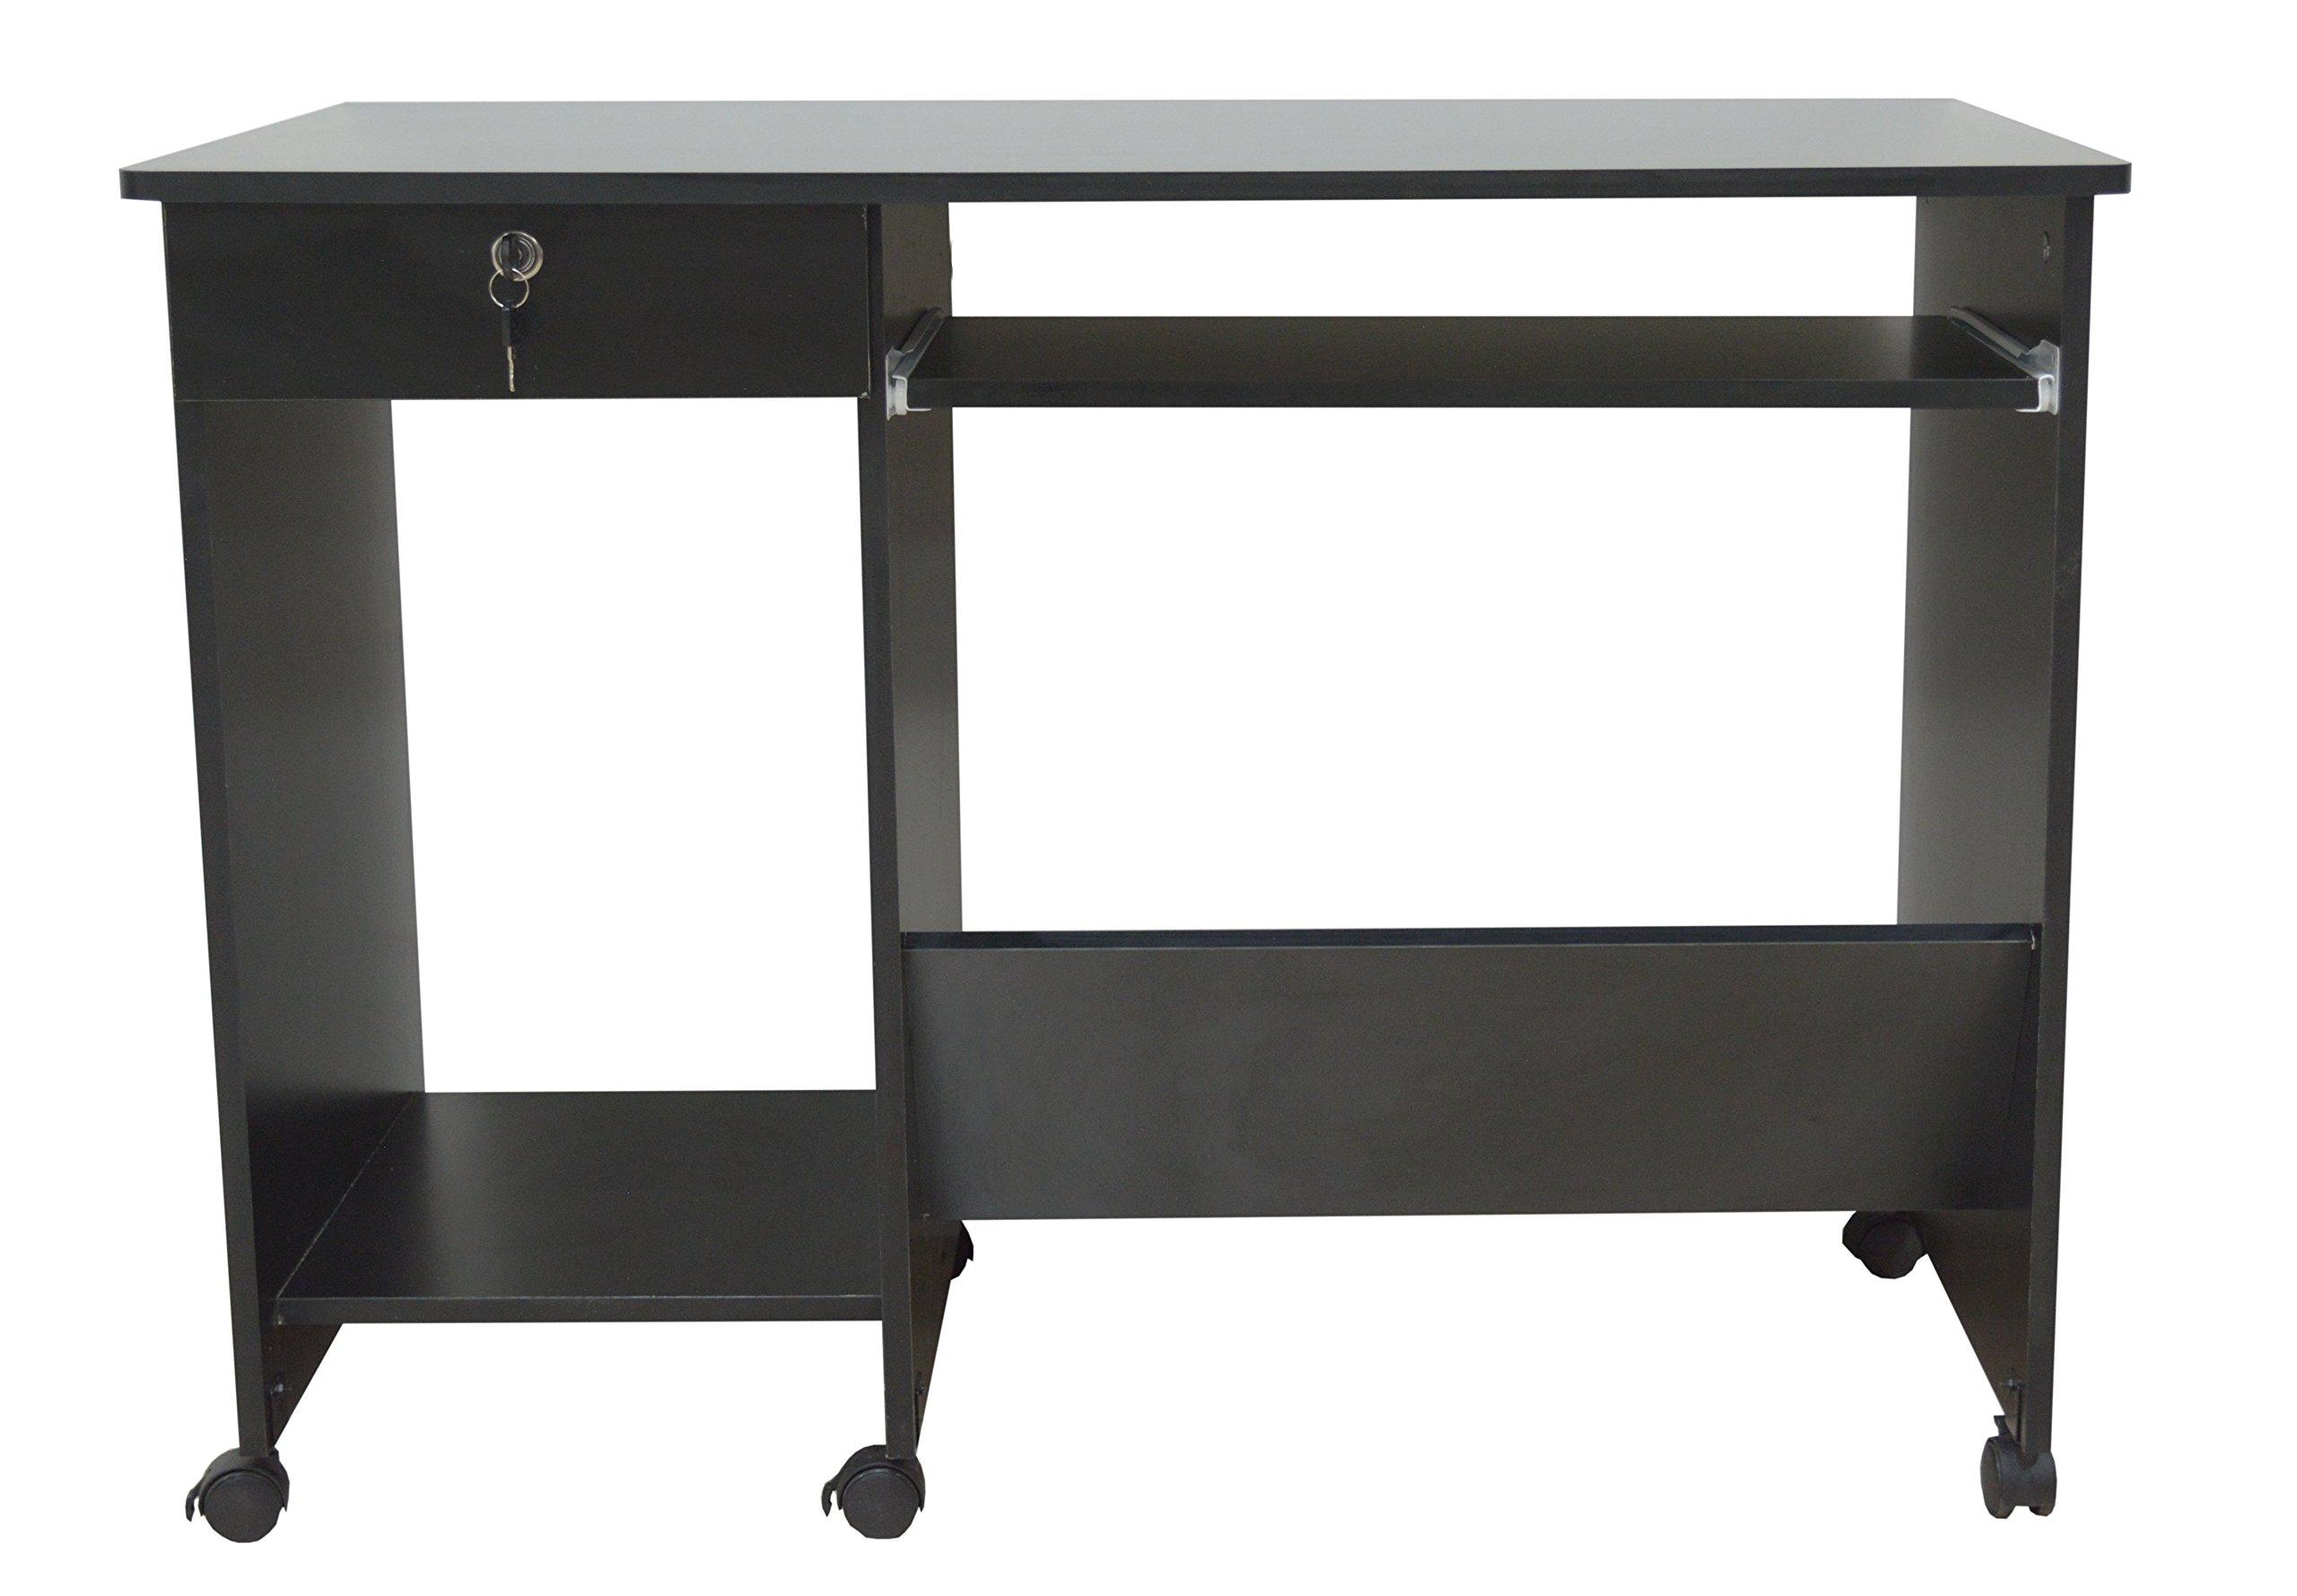 Sinai Furniture 740400350061 2 2 Sinai Computer Desk, Black